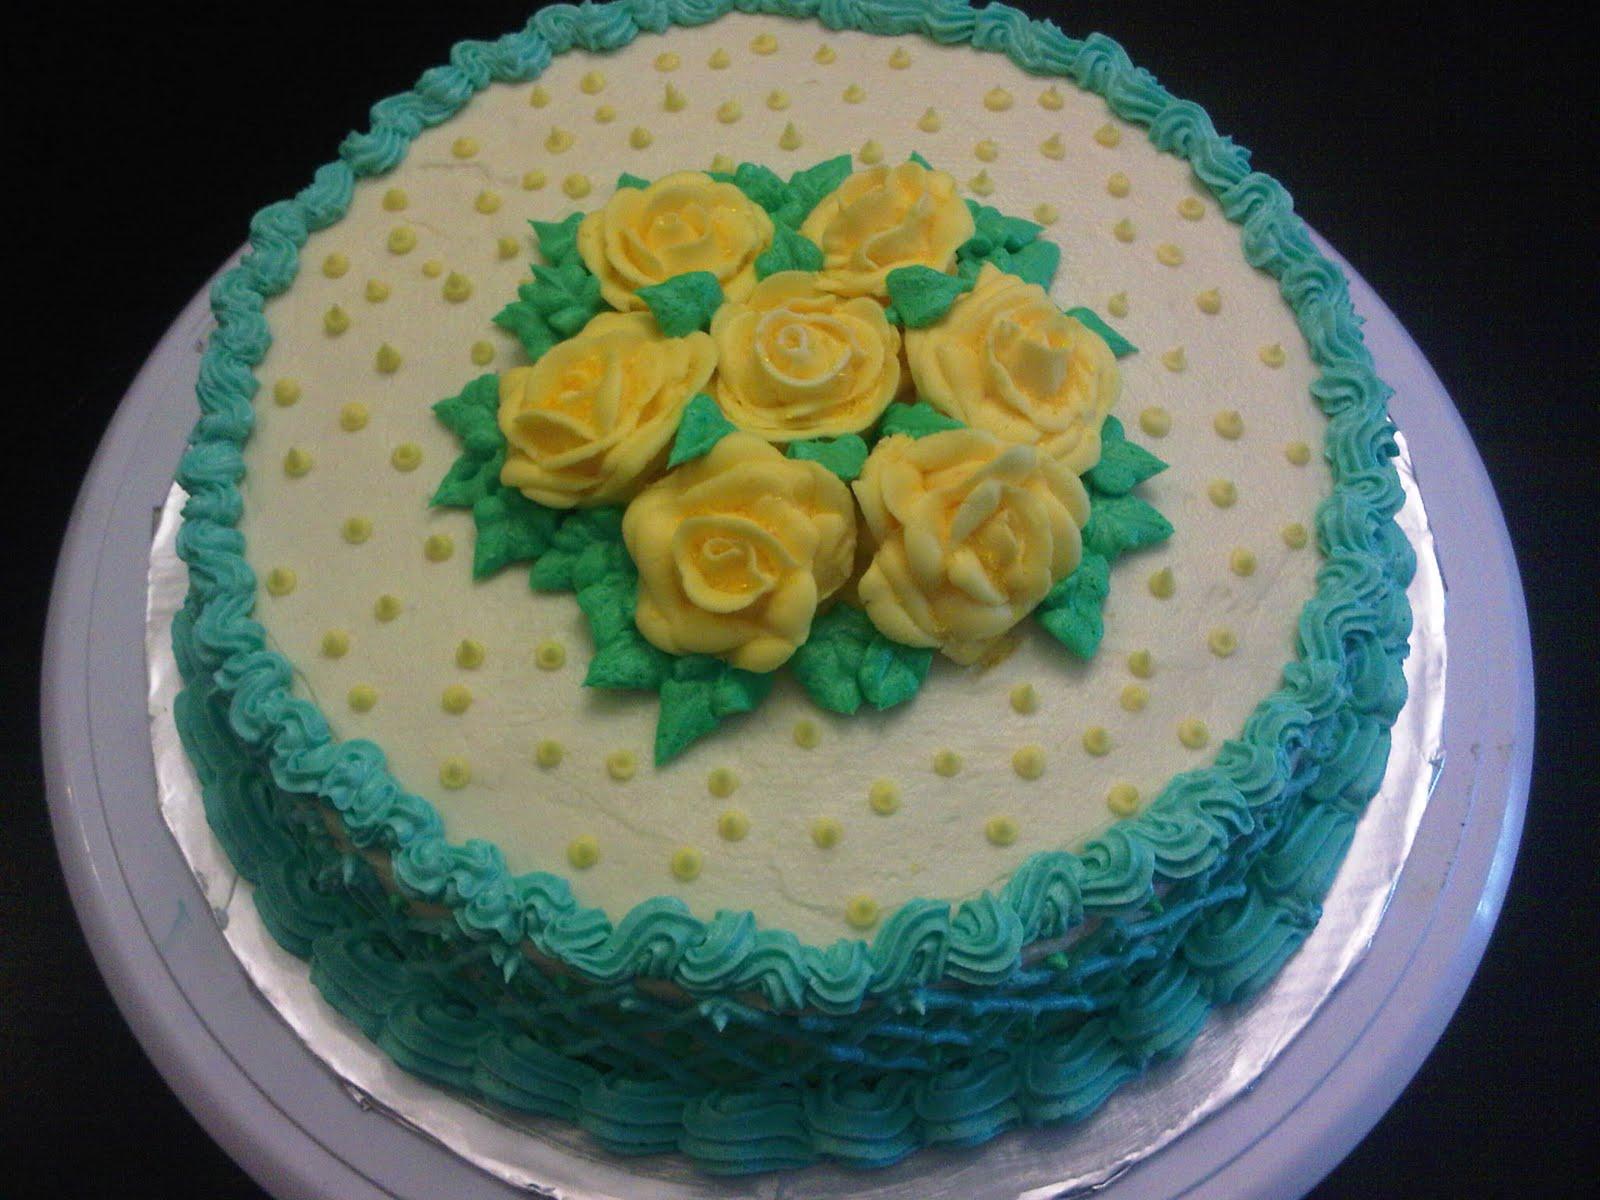 Cake Decorating Wilton : iHeartCrisM: Cakes since Wilton